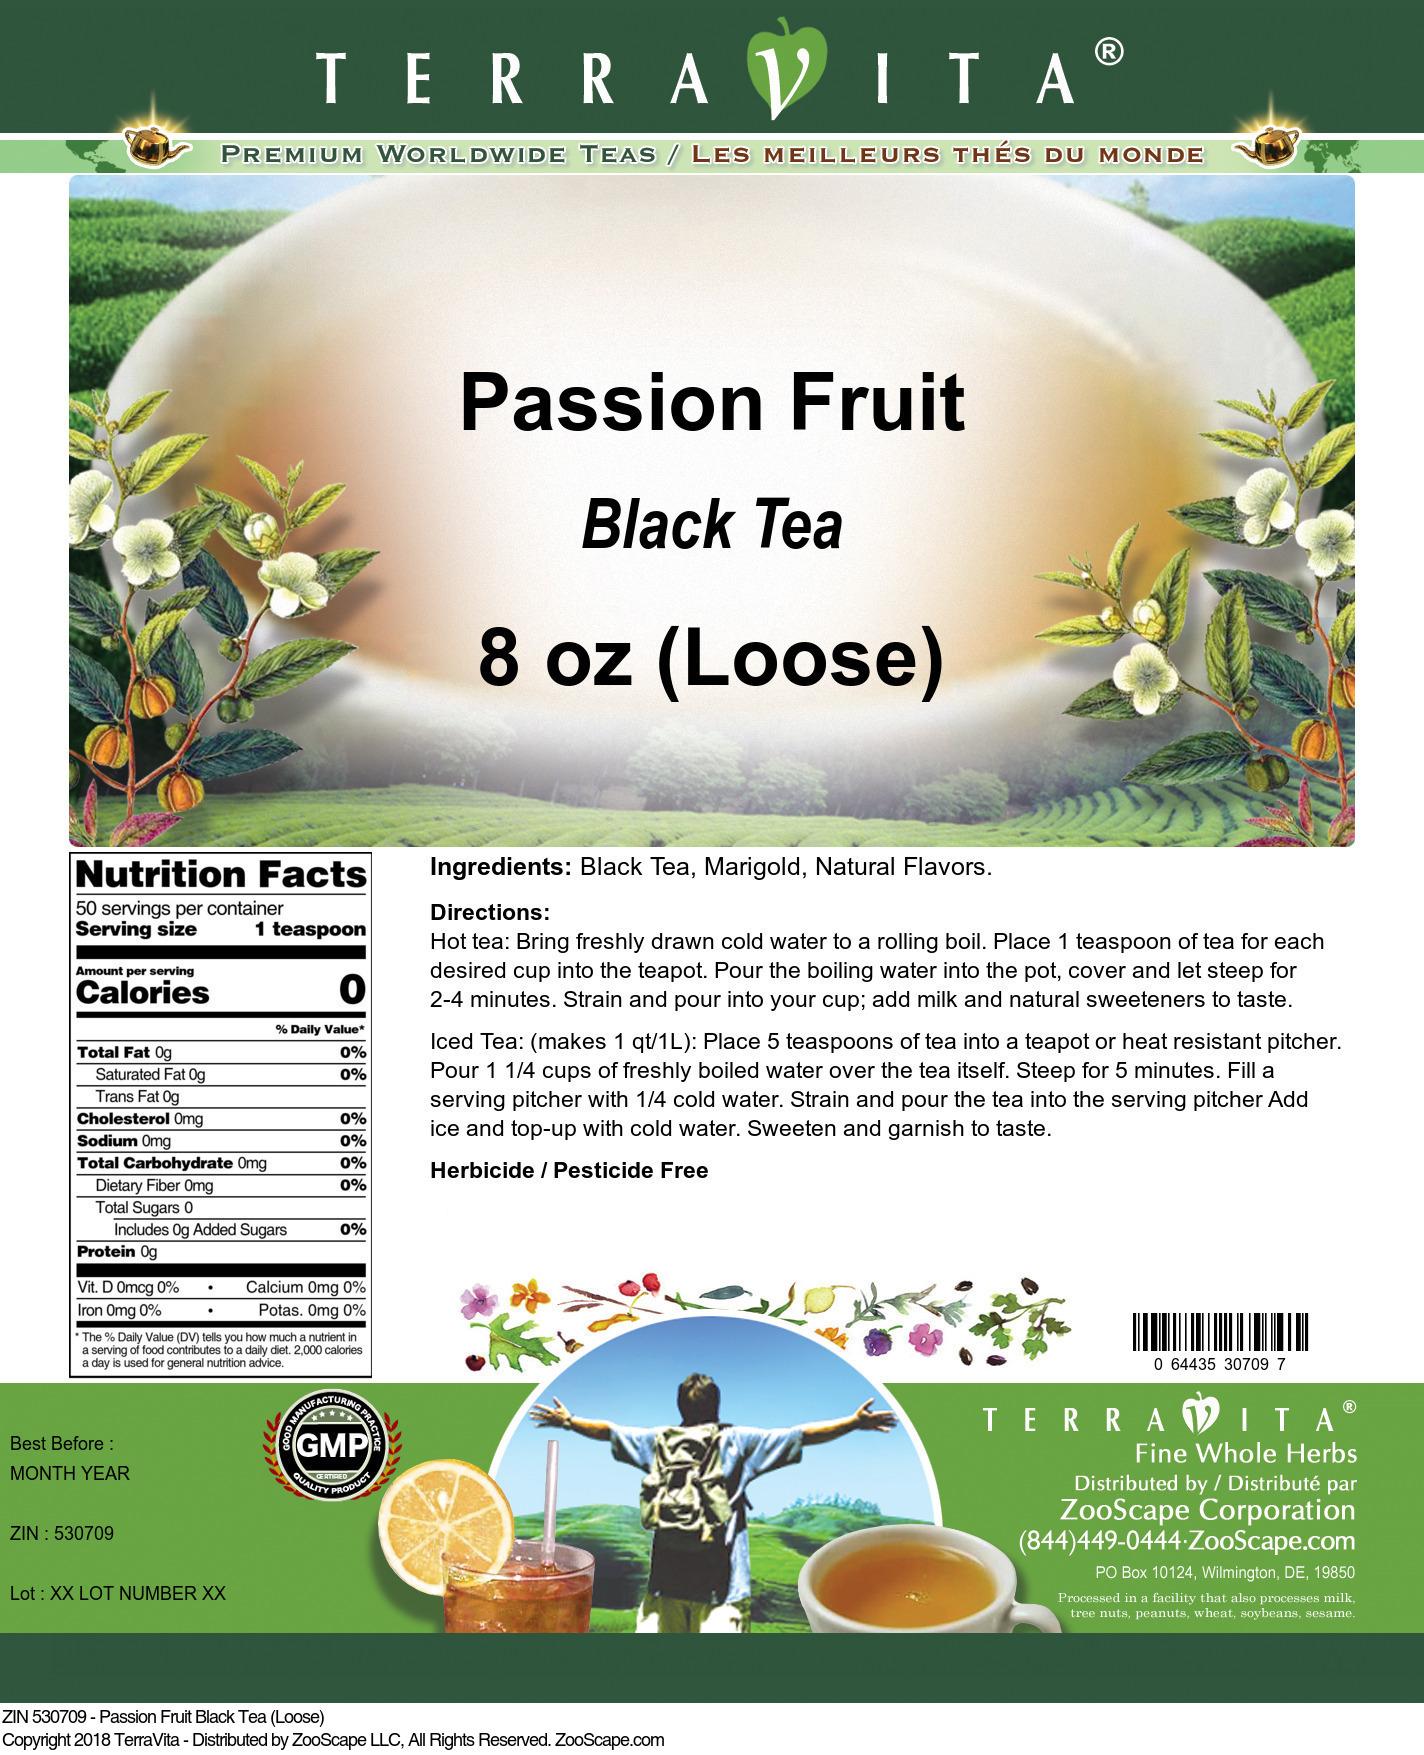 Passion Fruit Black Tea (Loose)